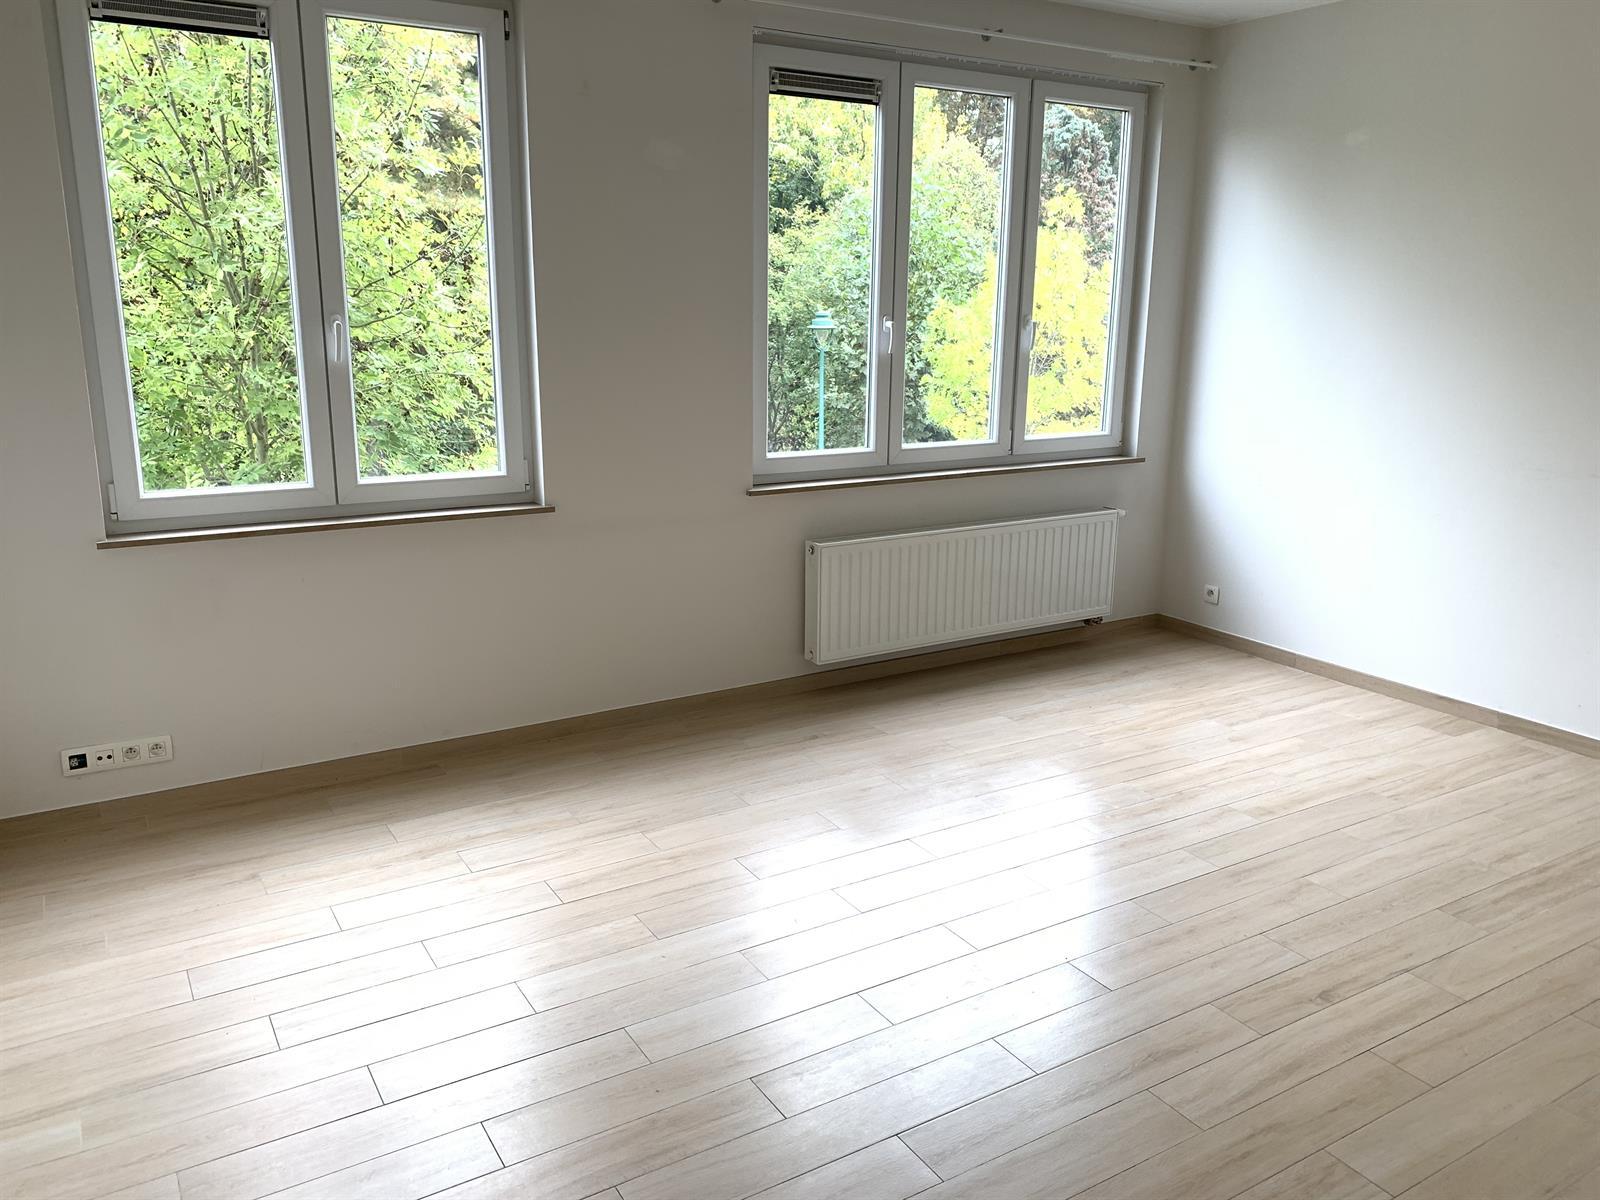 Appartement - Molenbeek-Saint-Jean - #4199507-1